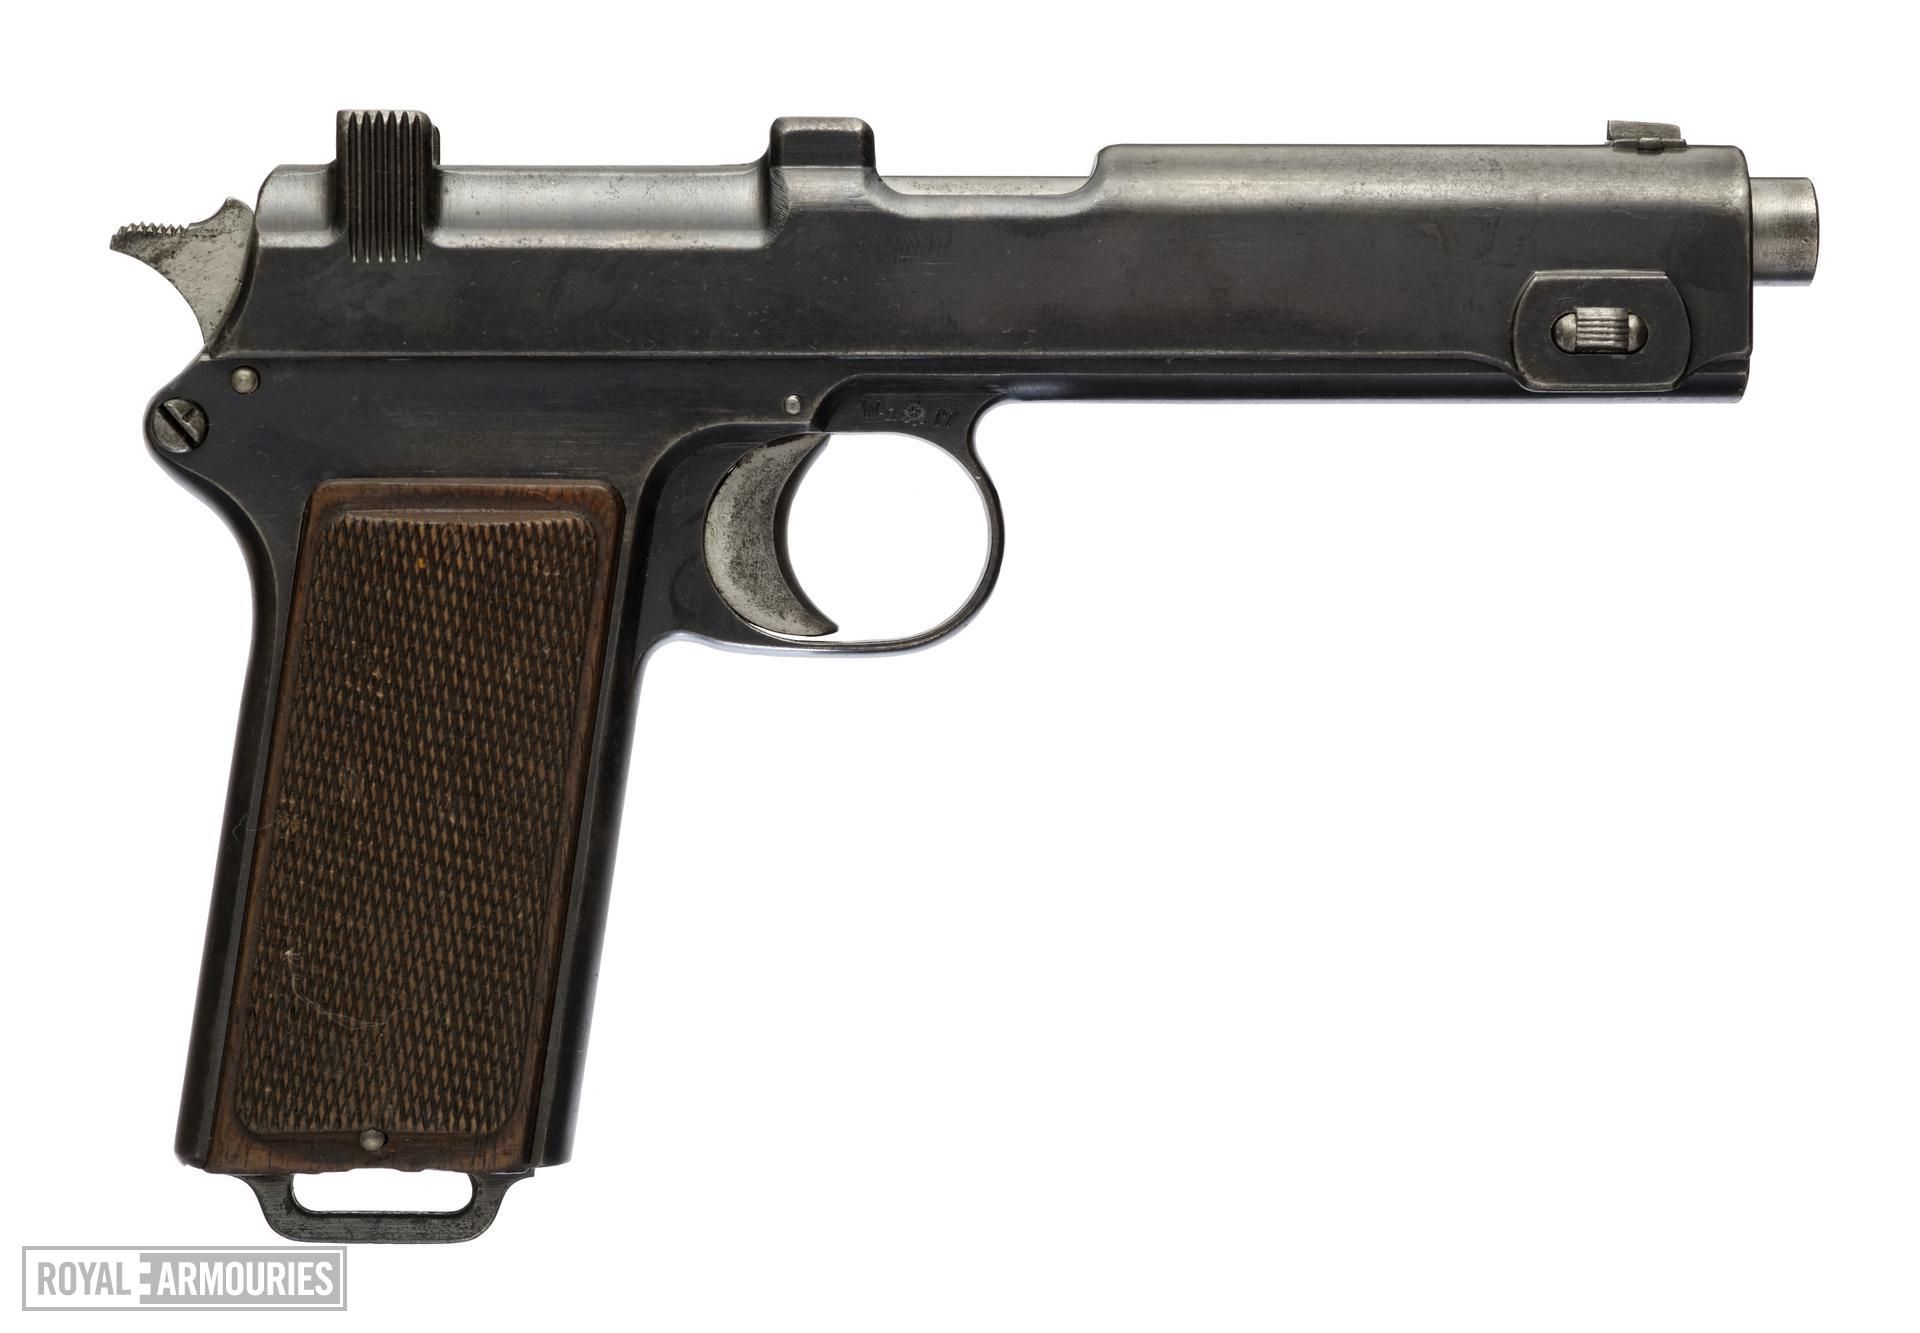 Centrefire self-loading pistol - Steyr Model 1912 Blowback operating system